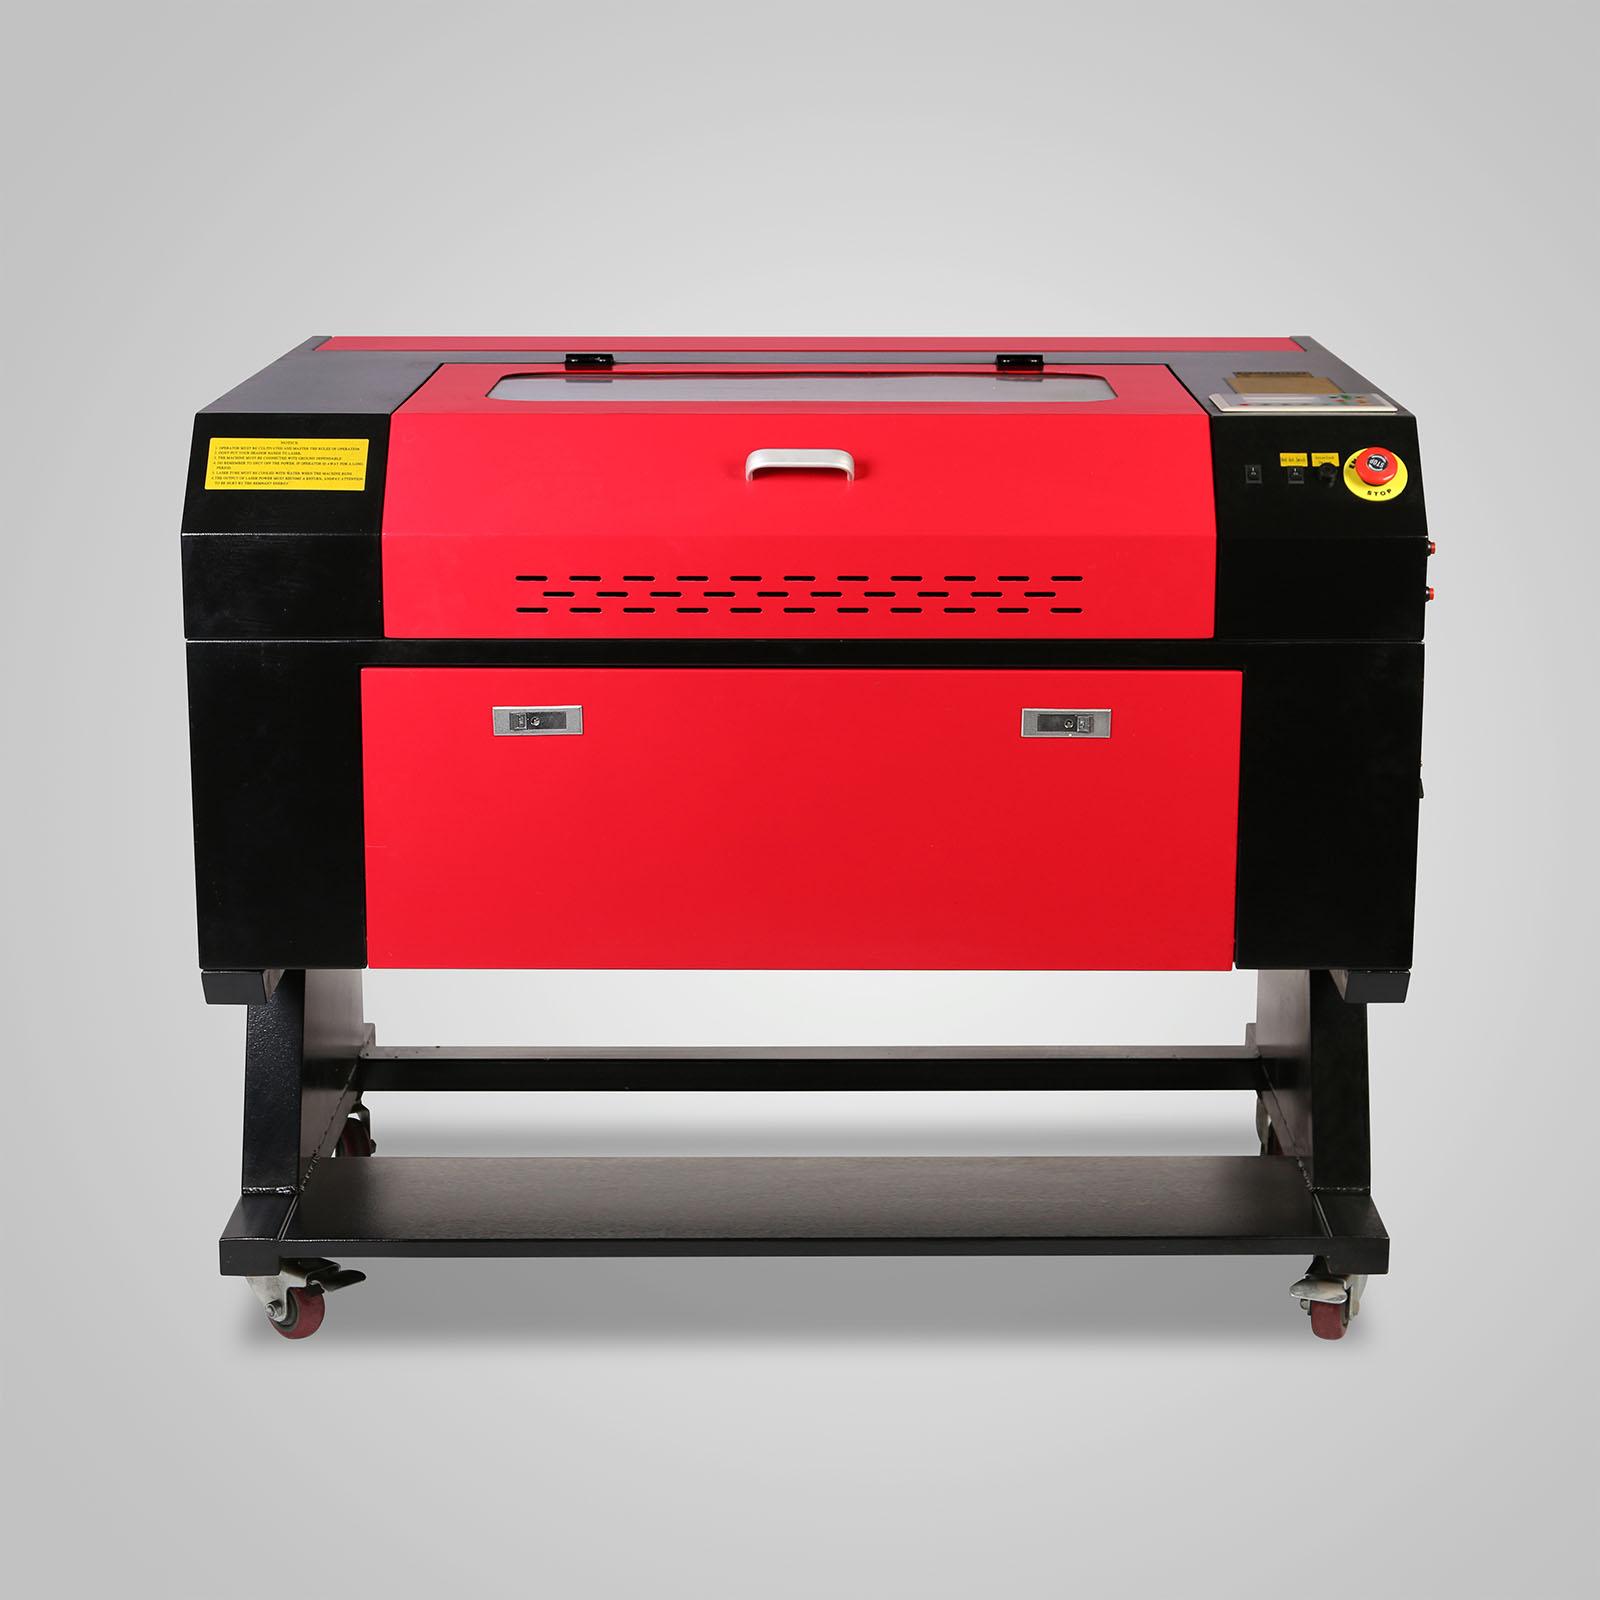 Macchina-per-Incisione-Laser-CO2-40-130W-Asse-Rotante-Tagliatrice-Incisore miniatura 38